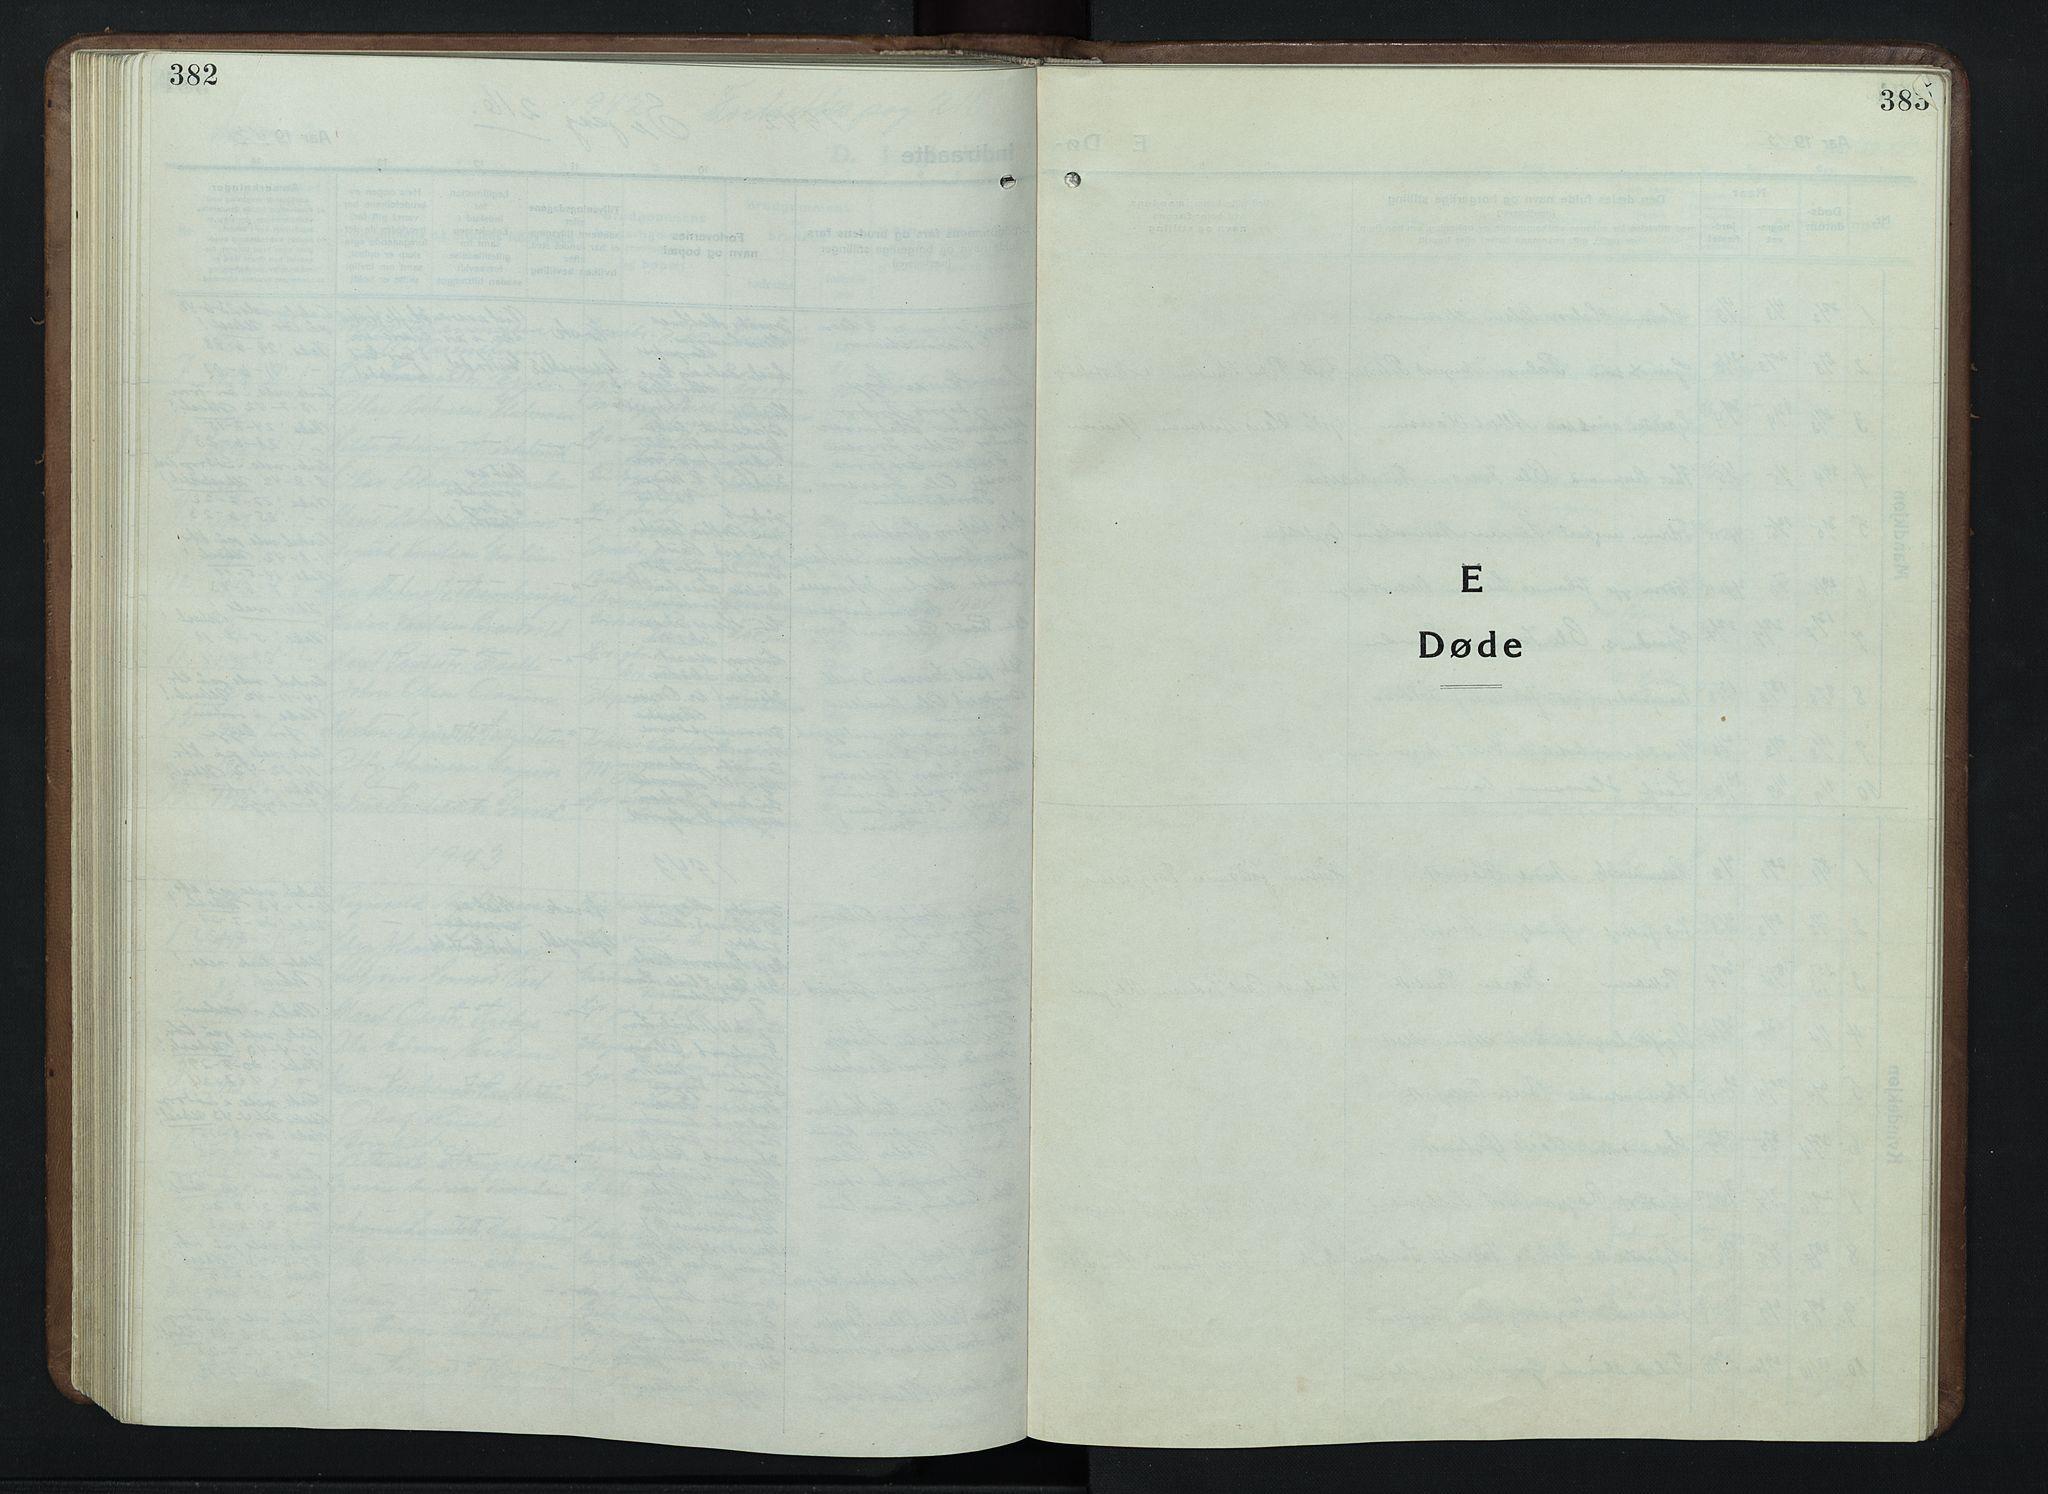 SAH, Nord-Fron prestekontor, Klokkerbok nr. 7, 1915-1946, s. 382-383